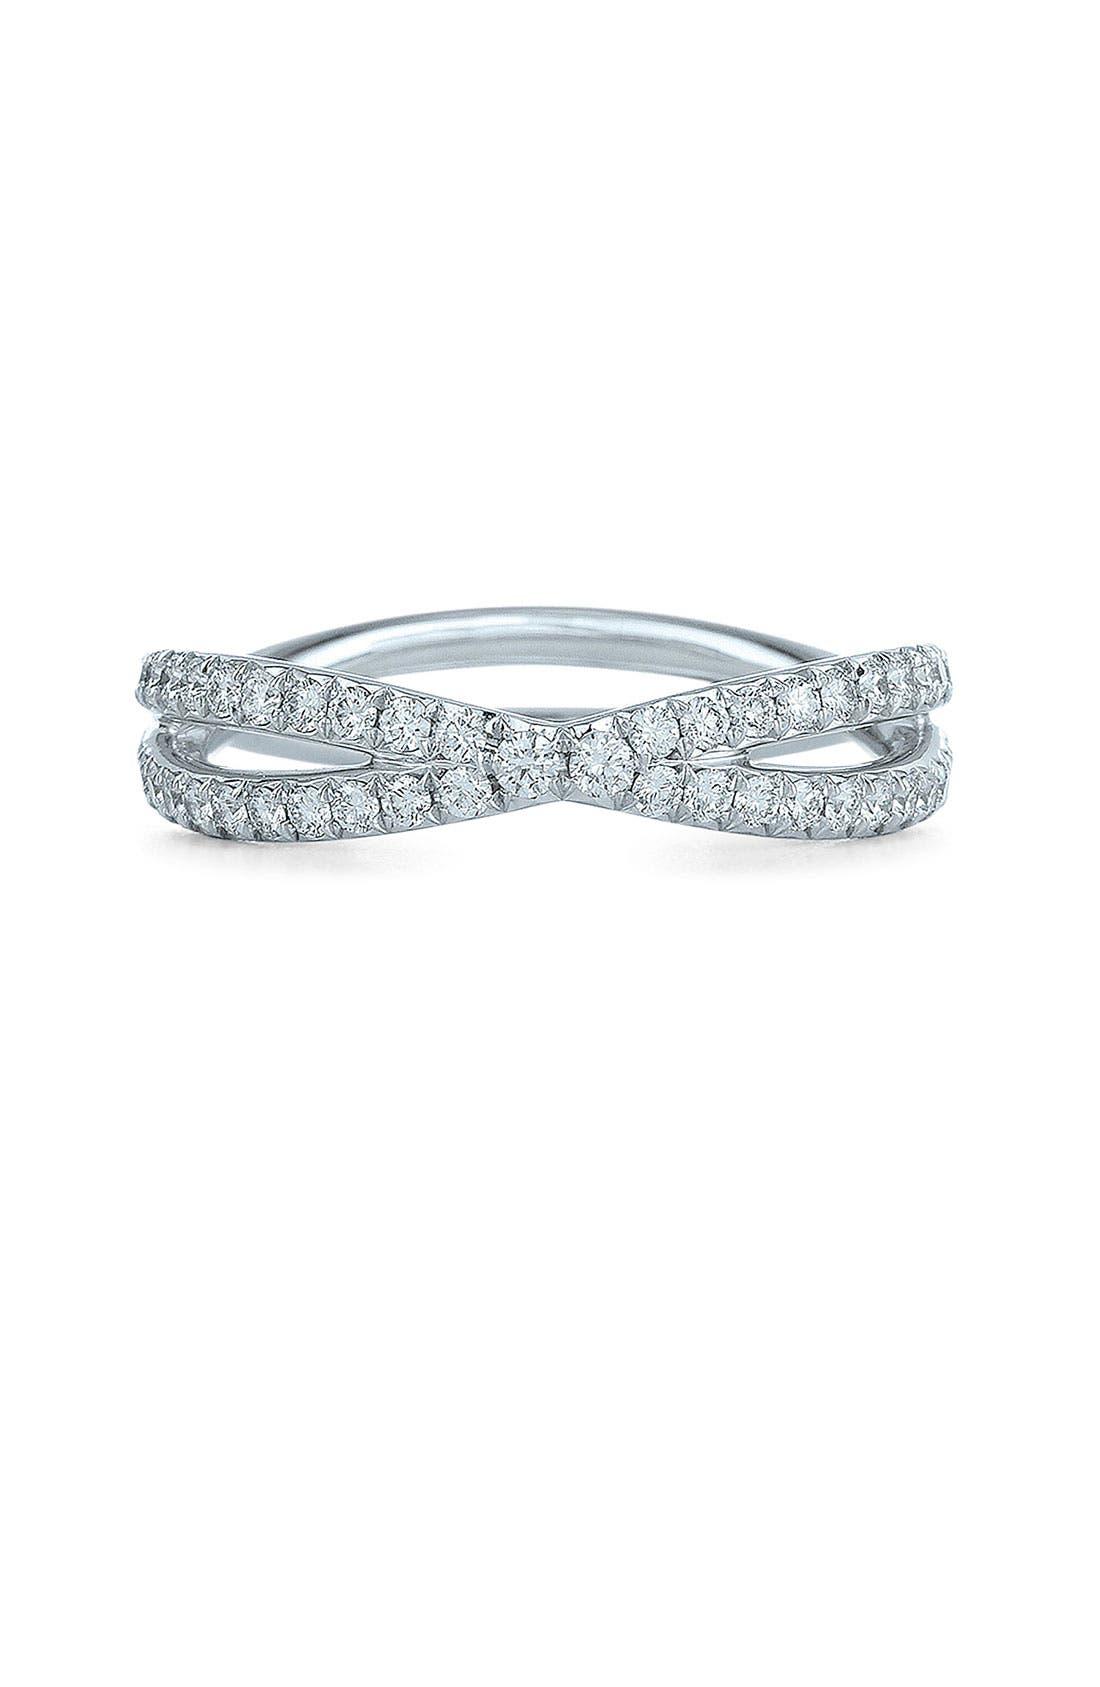 Main Image - Kwiat 'Fidelity' Diamond Crossover Ring